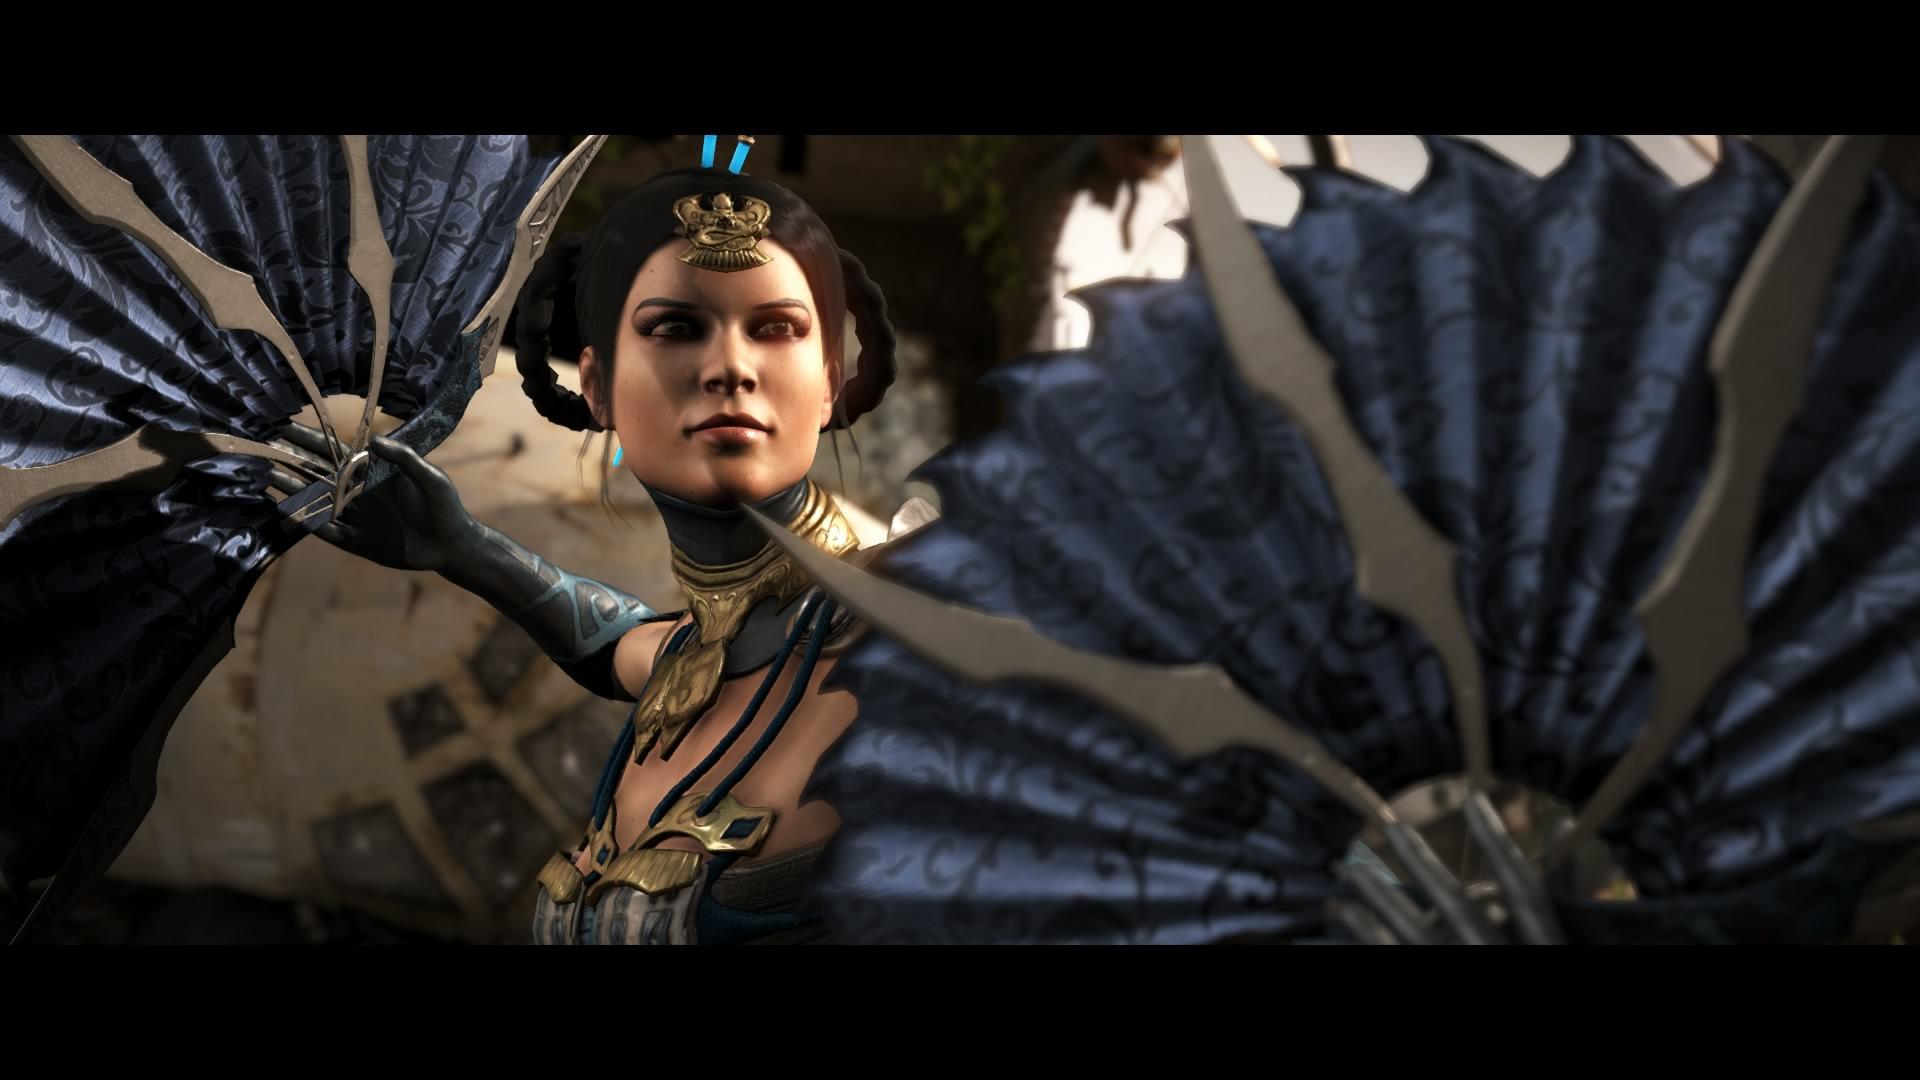 Mortal Kombat X Kitana Intro Pose By Kabukiart157 On Deviantart